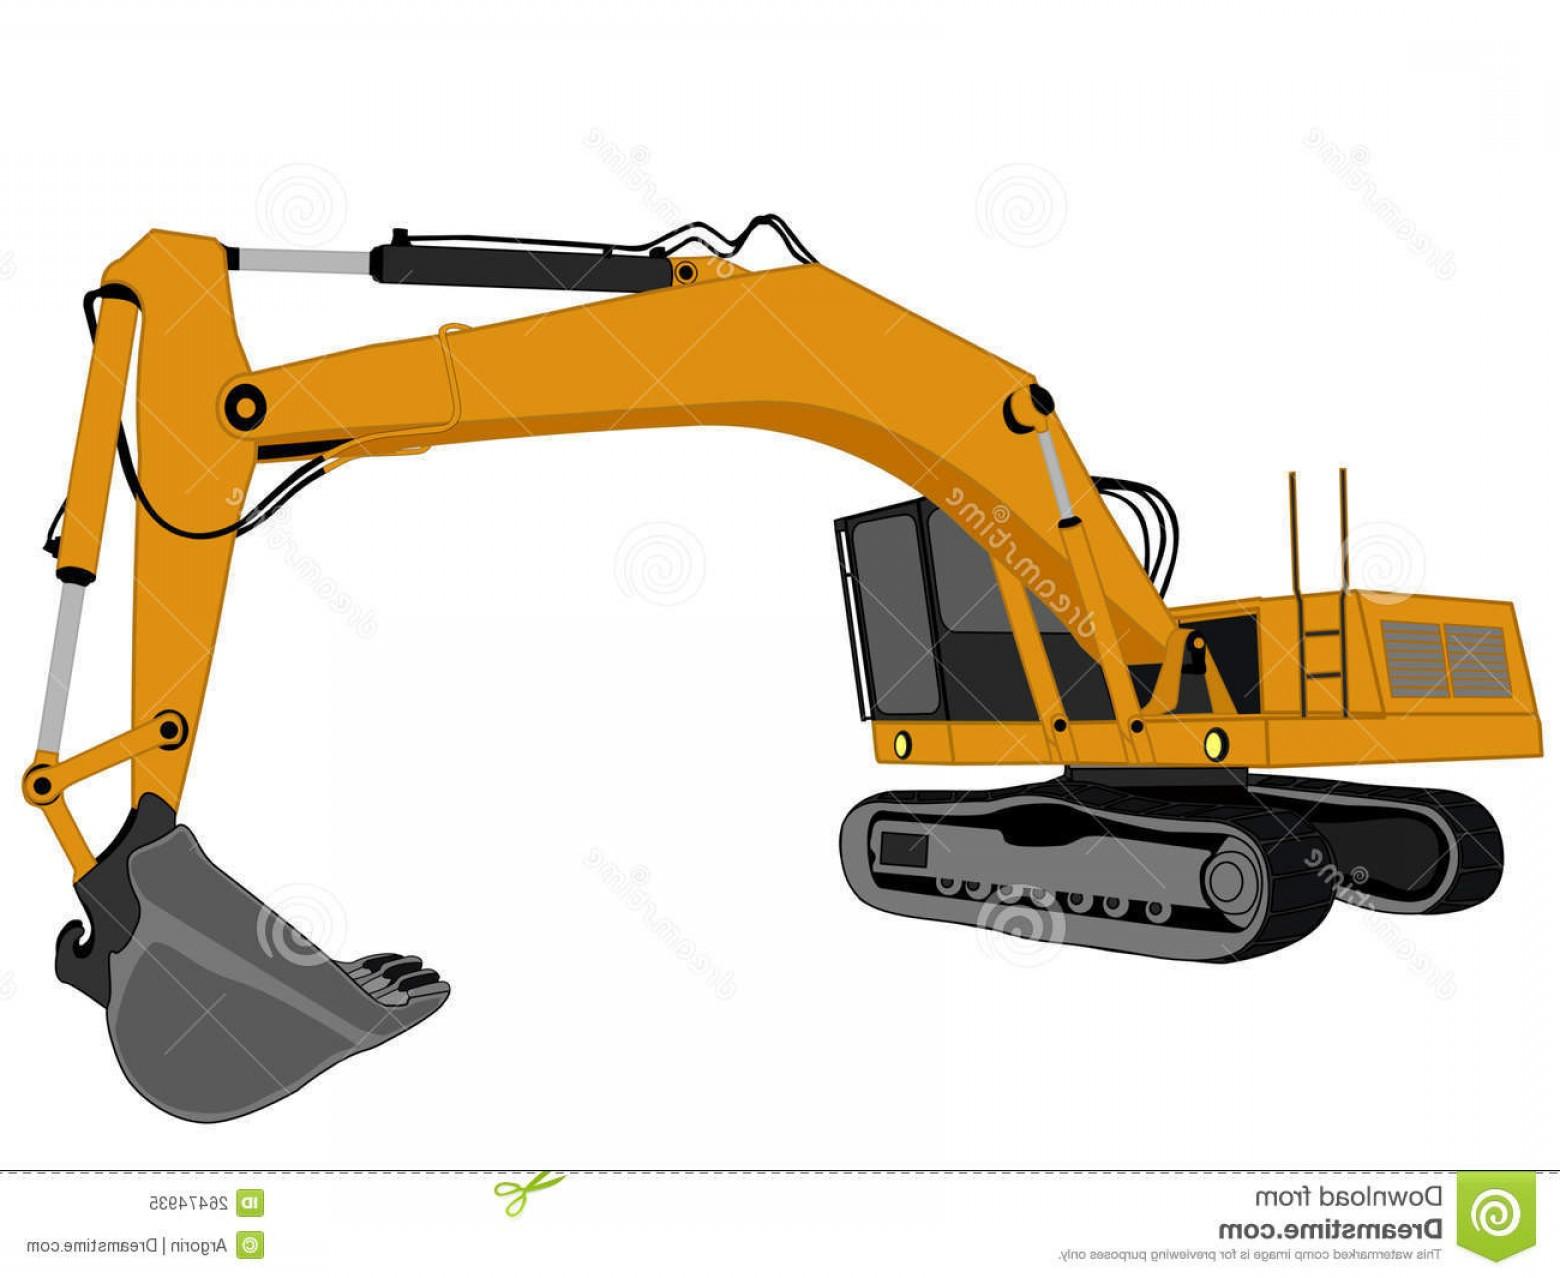 Backhoe clipart trackhoe. Equipment lovely cat excavator